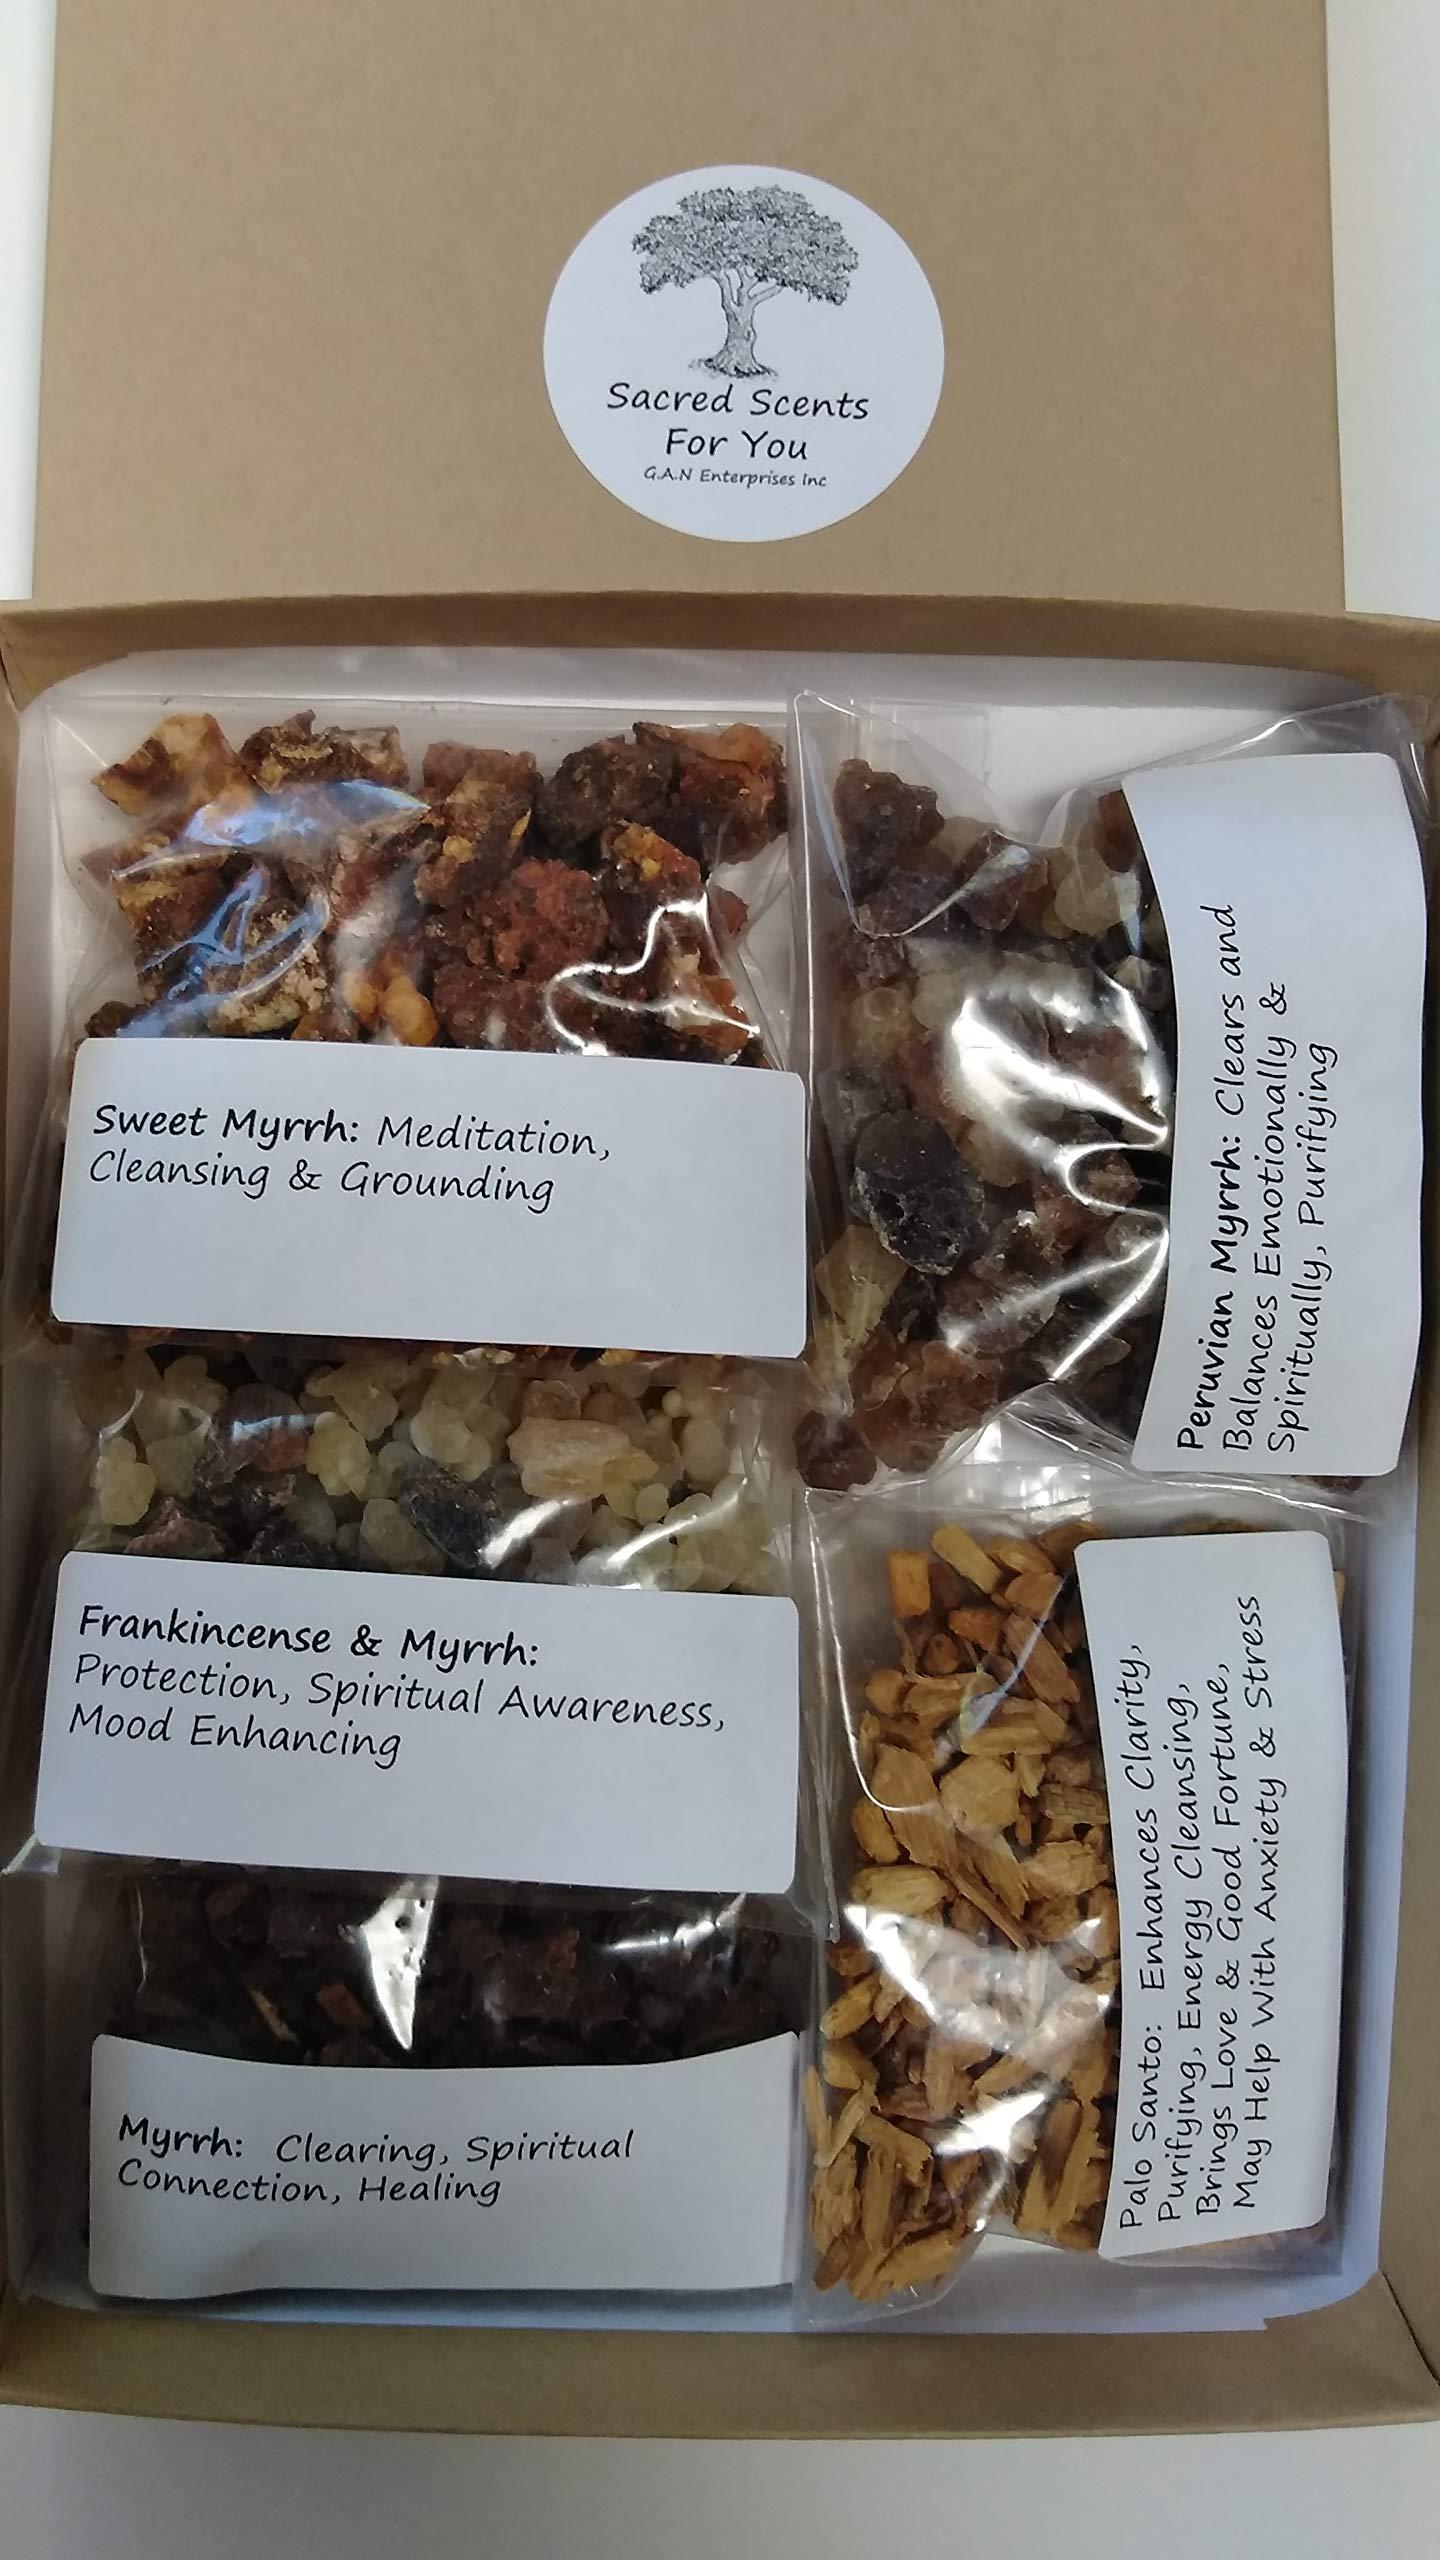 Sacred Scents For You Resin Incense Variety Myrrh Sampler Pack-1 oz Myrrh Select-Sweet Myrrh-Peruvian Myrrh-Frankincense & Myrrh with Palo Santo Chips by Sacred Scents For You